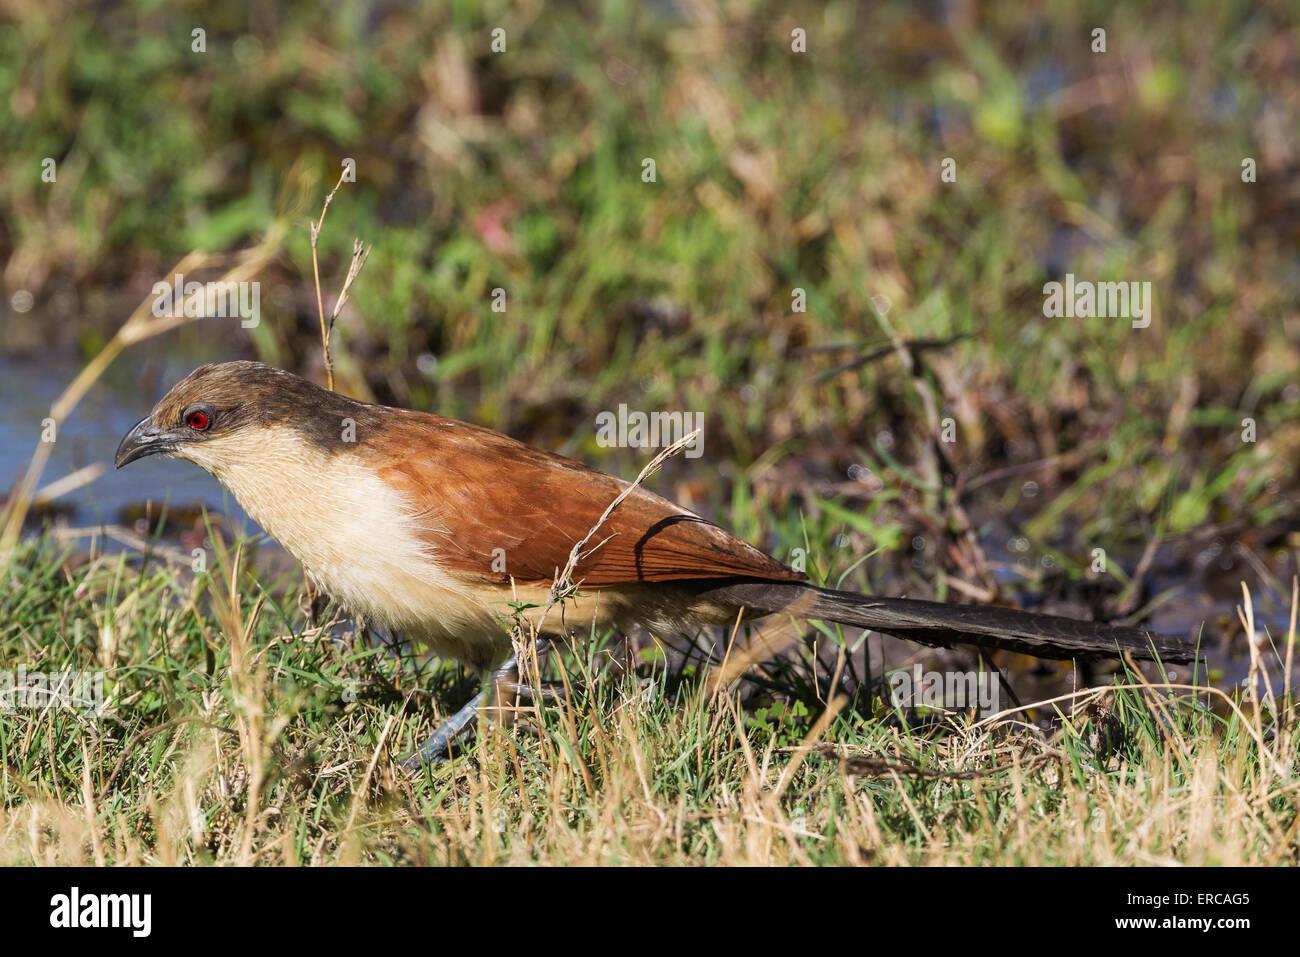 Senegal Coucal (Centropus senegalensis), Okavango Delta, Moremi Game Reserve, Botswana - Stock Image